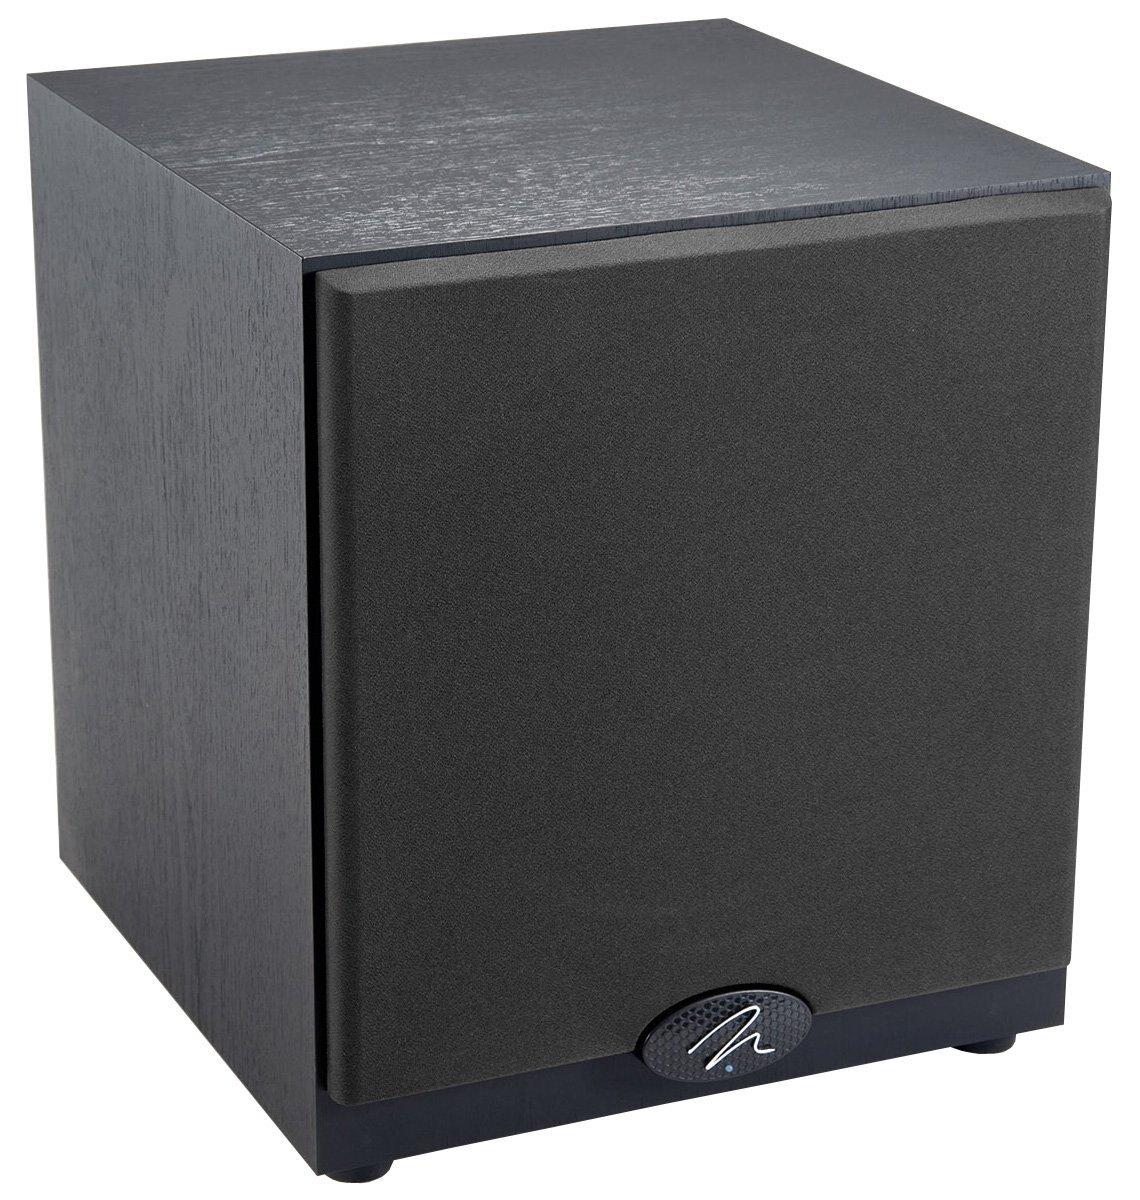 MartinLogan Dynamo 500 Powered Subwoofer Black : $152.96 AC + Free Shipping